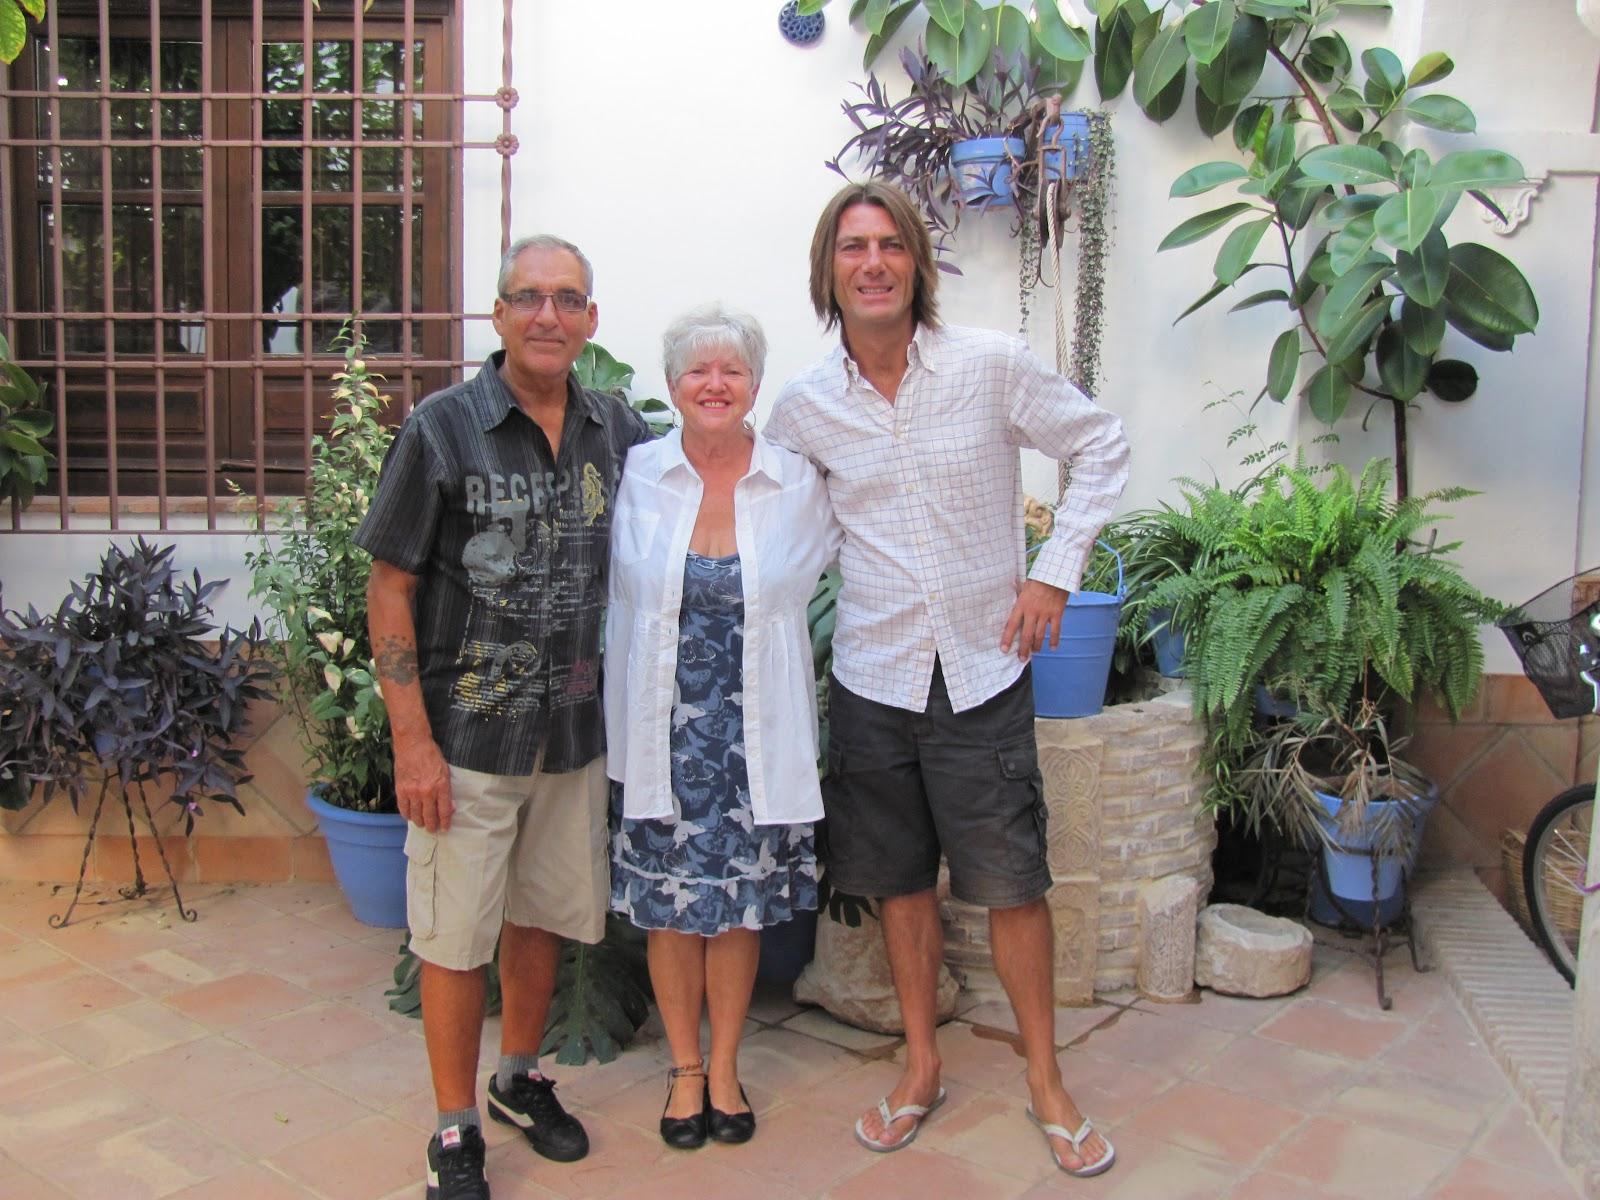 Europe 2012 cordoba notre nid for Auberge jardin champetre magog